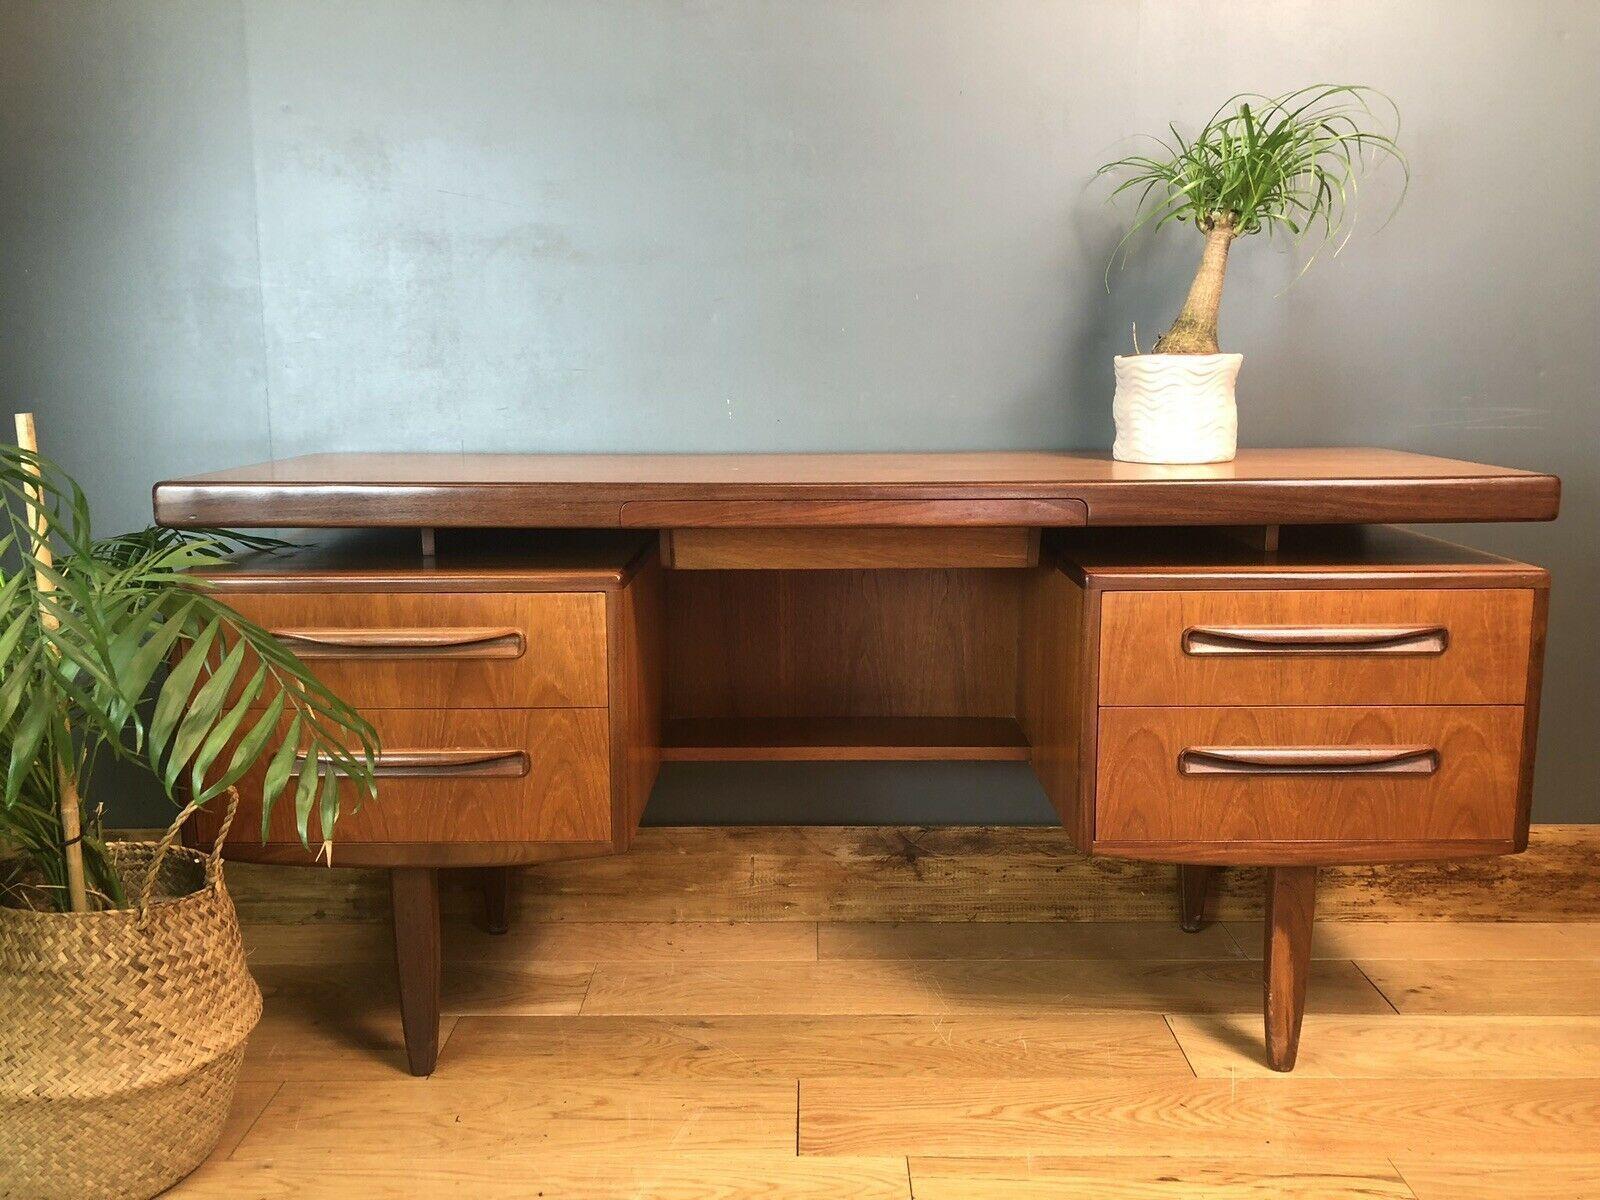 vintage g plan floating shelf desk dressing table mid century sideboard retro 0